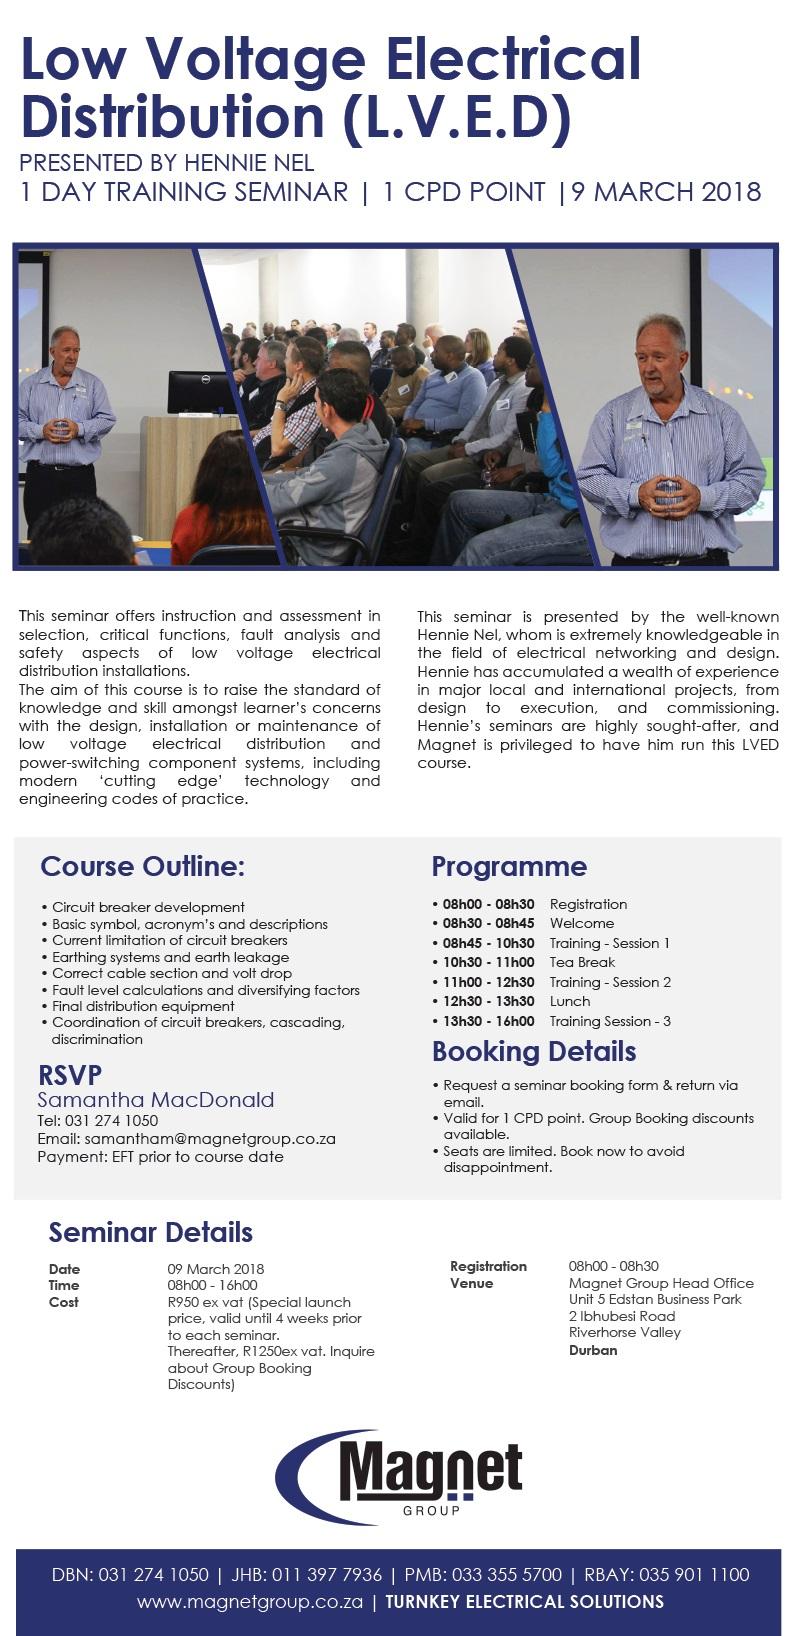 LVED Seminar 09 March 2018